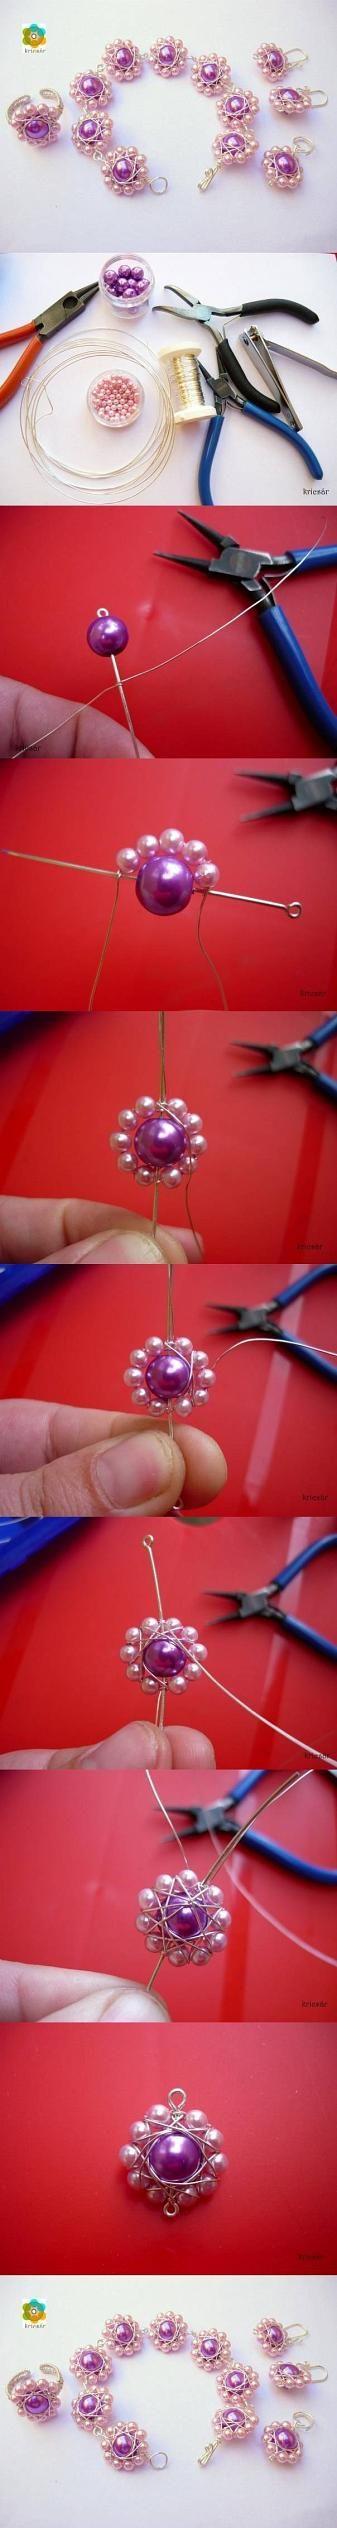 DIY Bead Flower Internet Tutorial DIY Projects | UsefulDIY.com